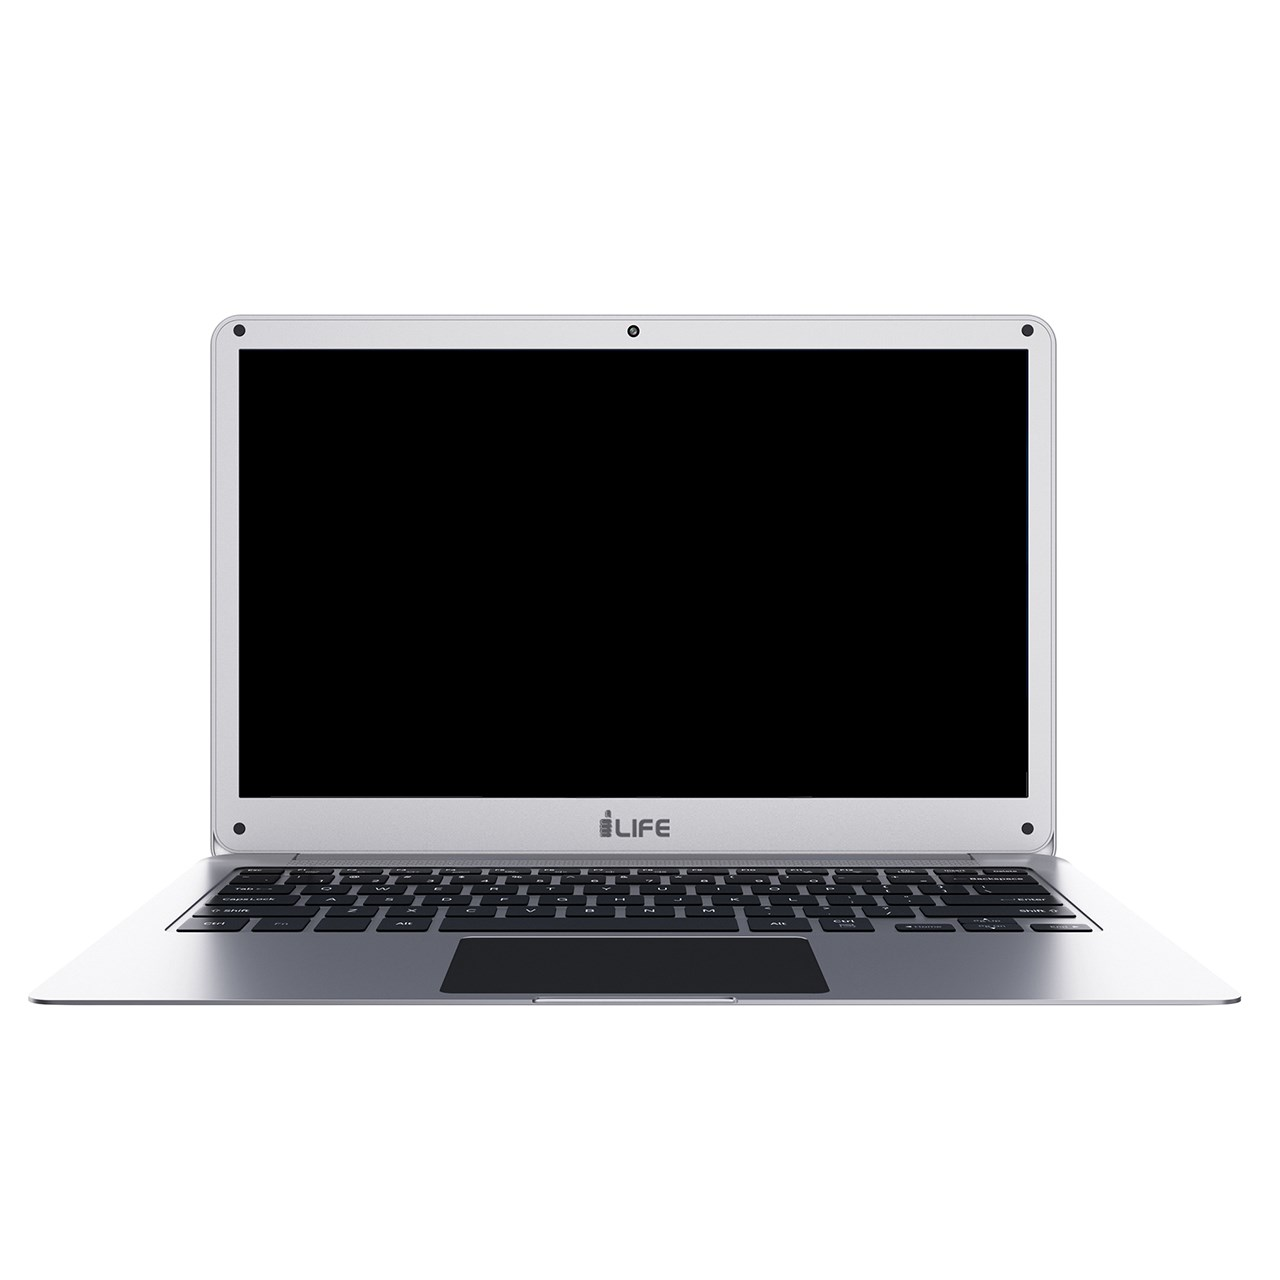 لپ تاپ 14 اینچی آی لایف مدل Zed Air H